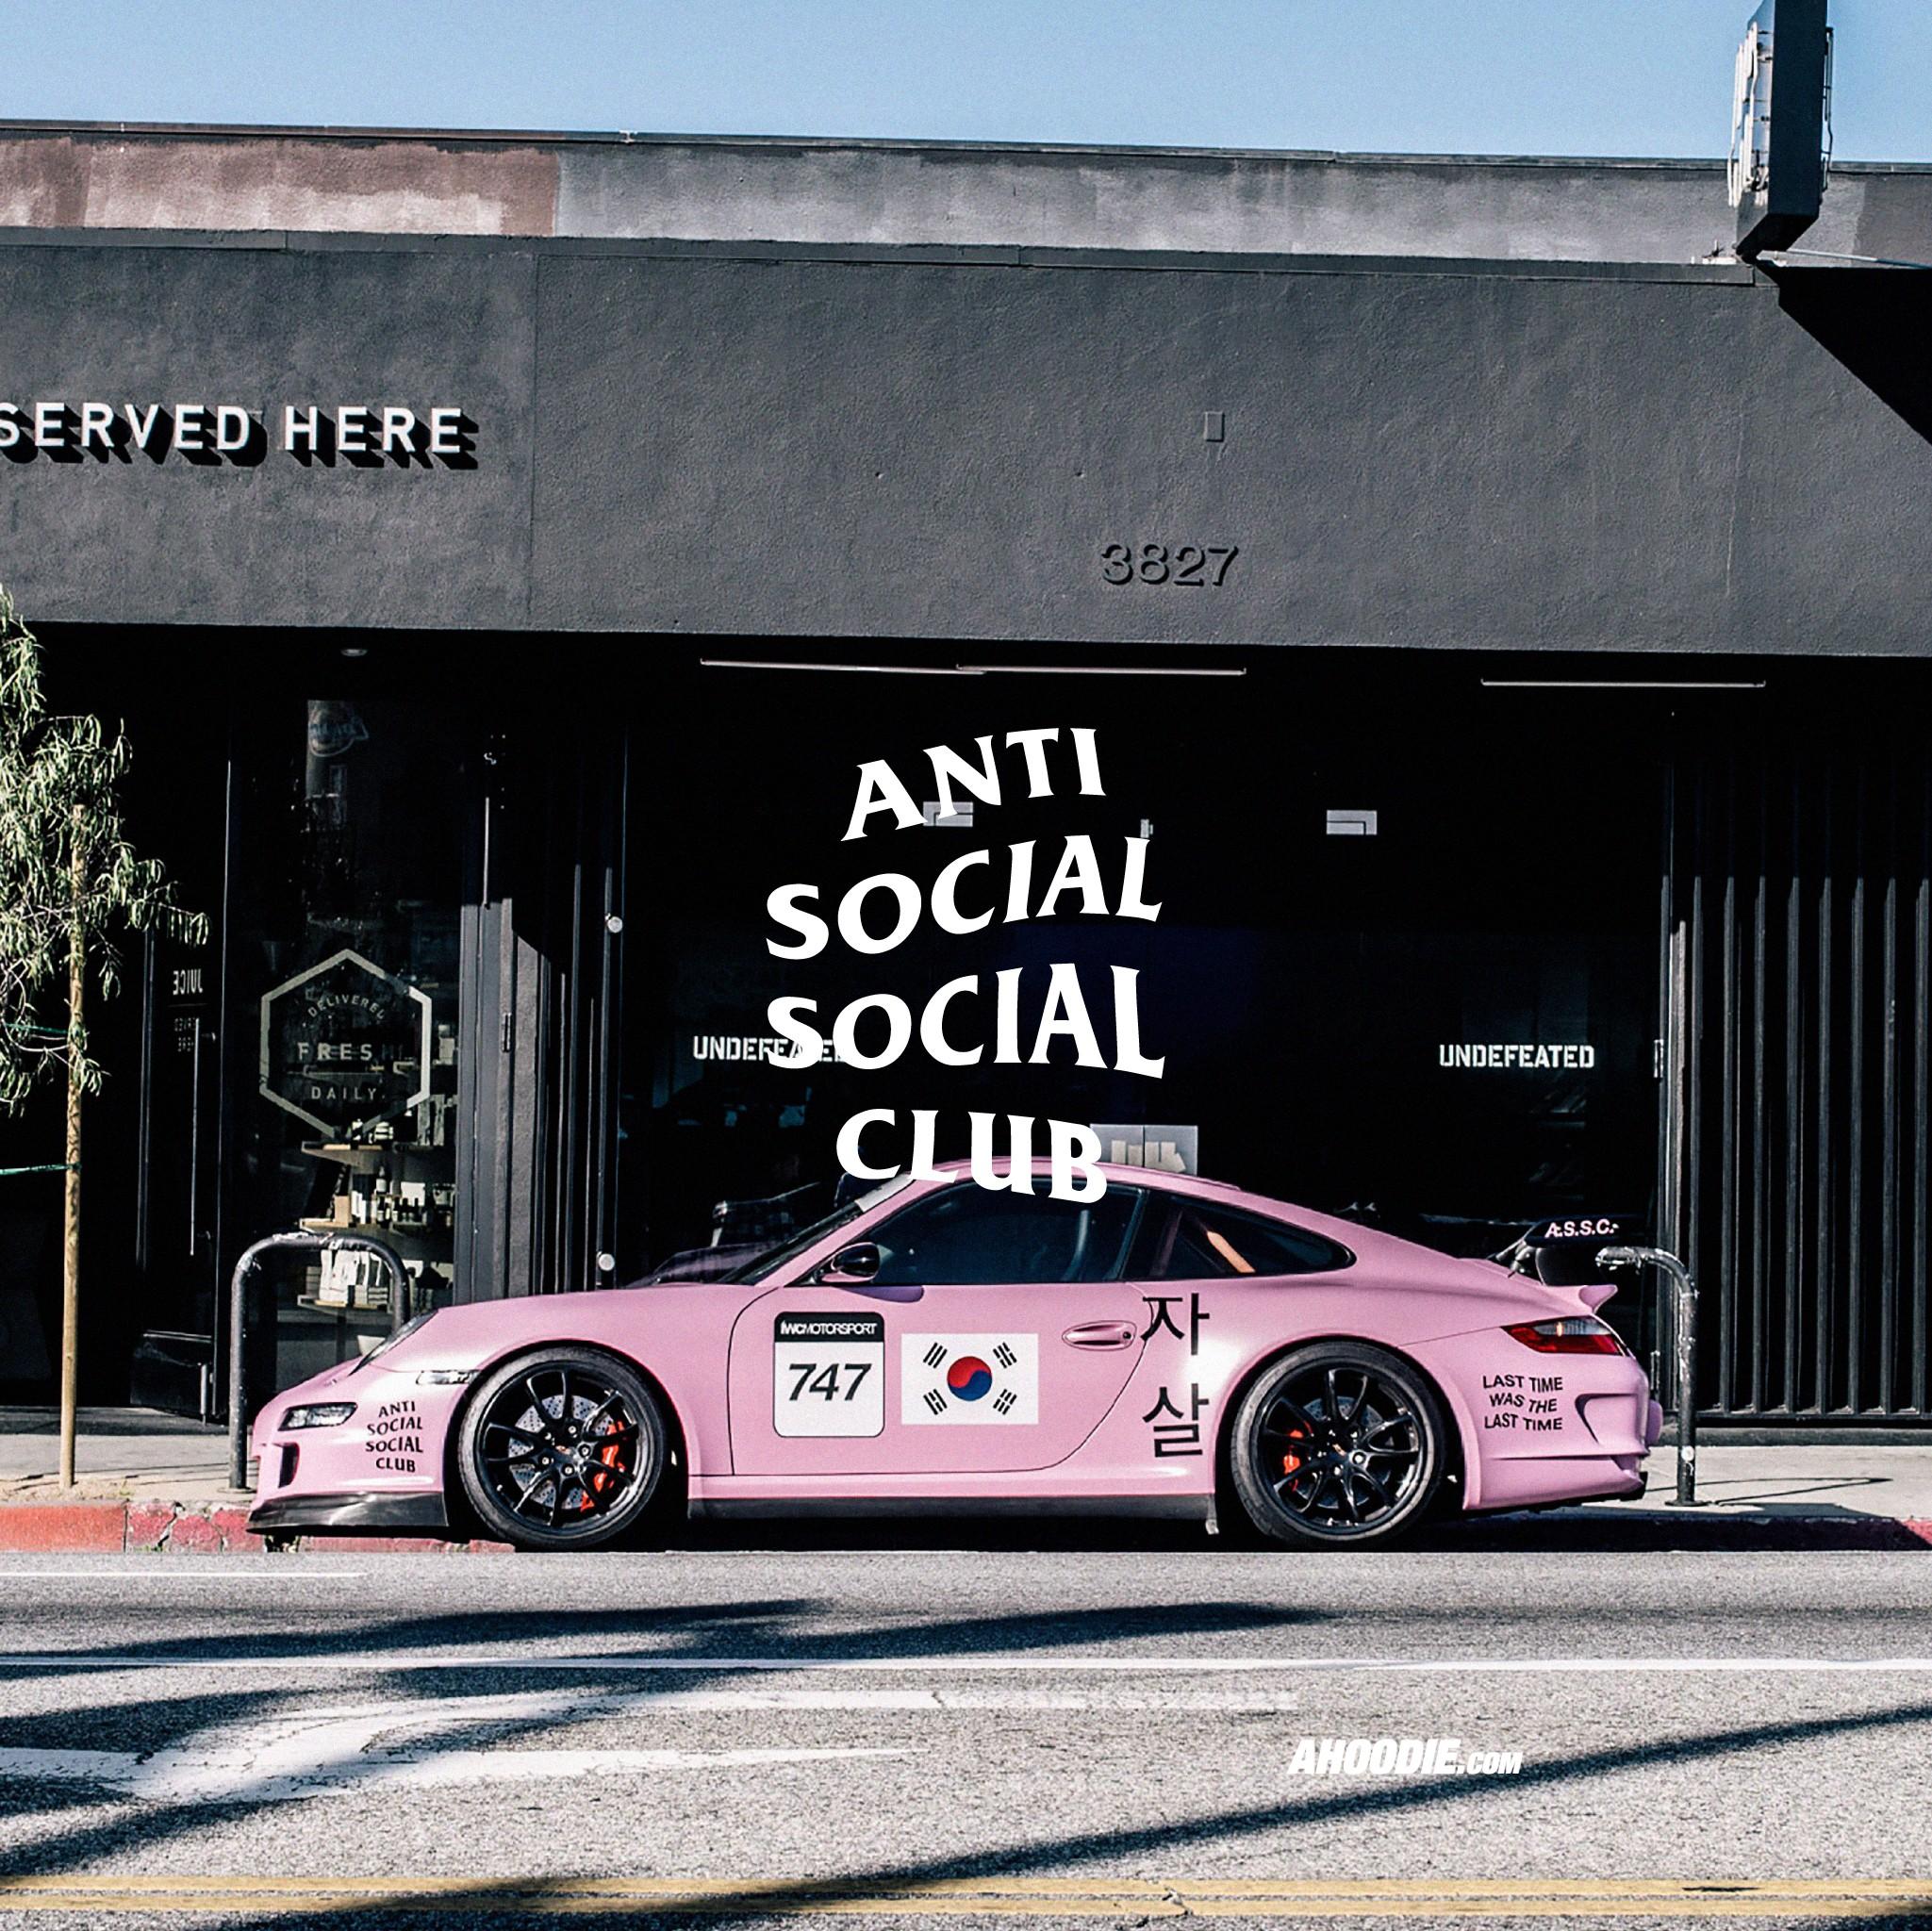 Bad Girl Wallpapers Hd Ahoodie Anti Social Social Club Pink Porsche Wallpaper